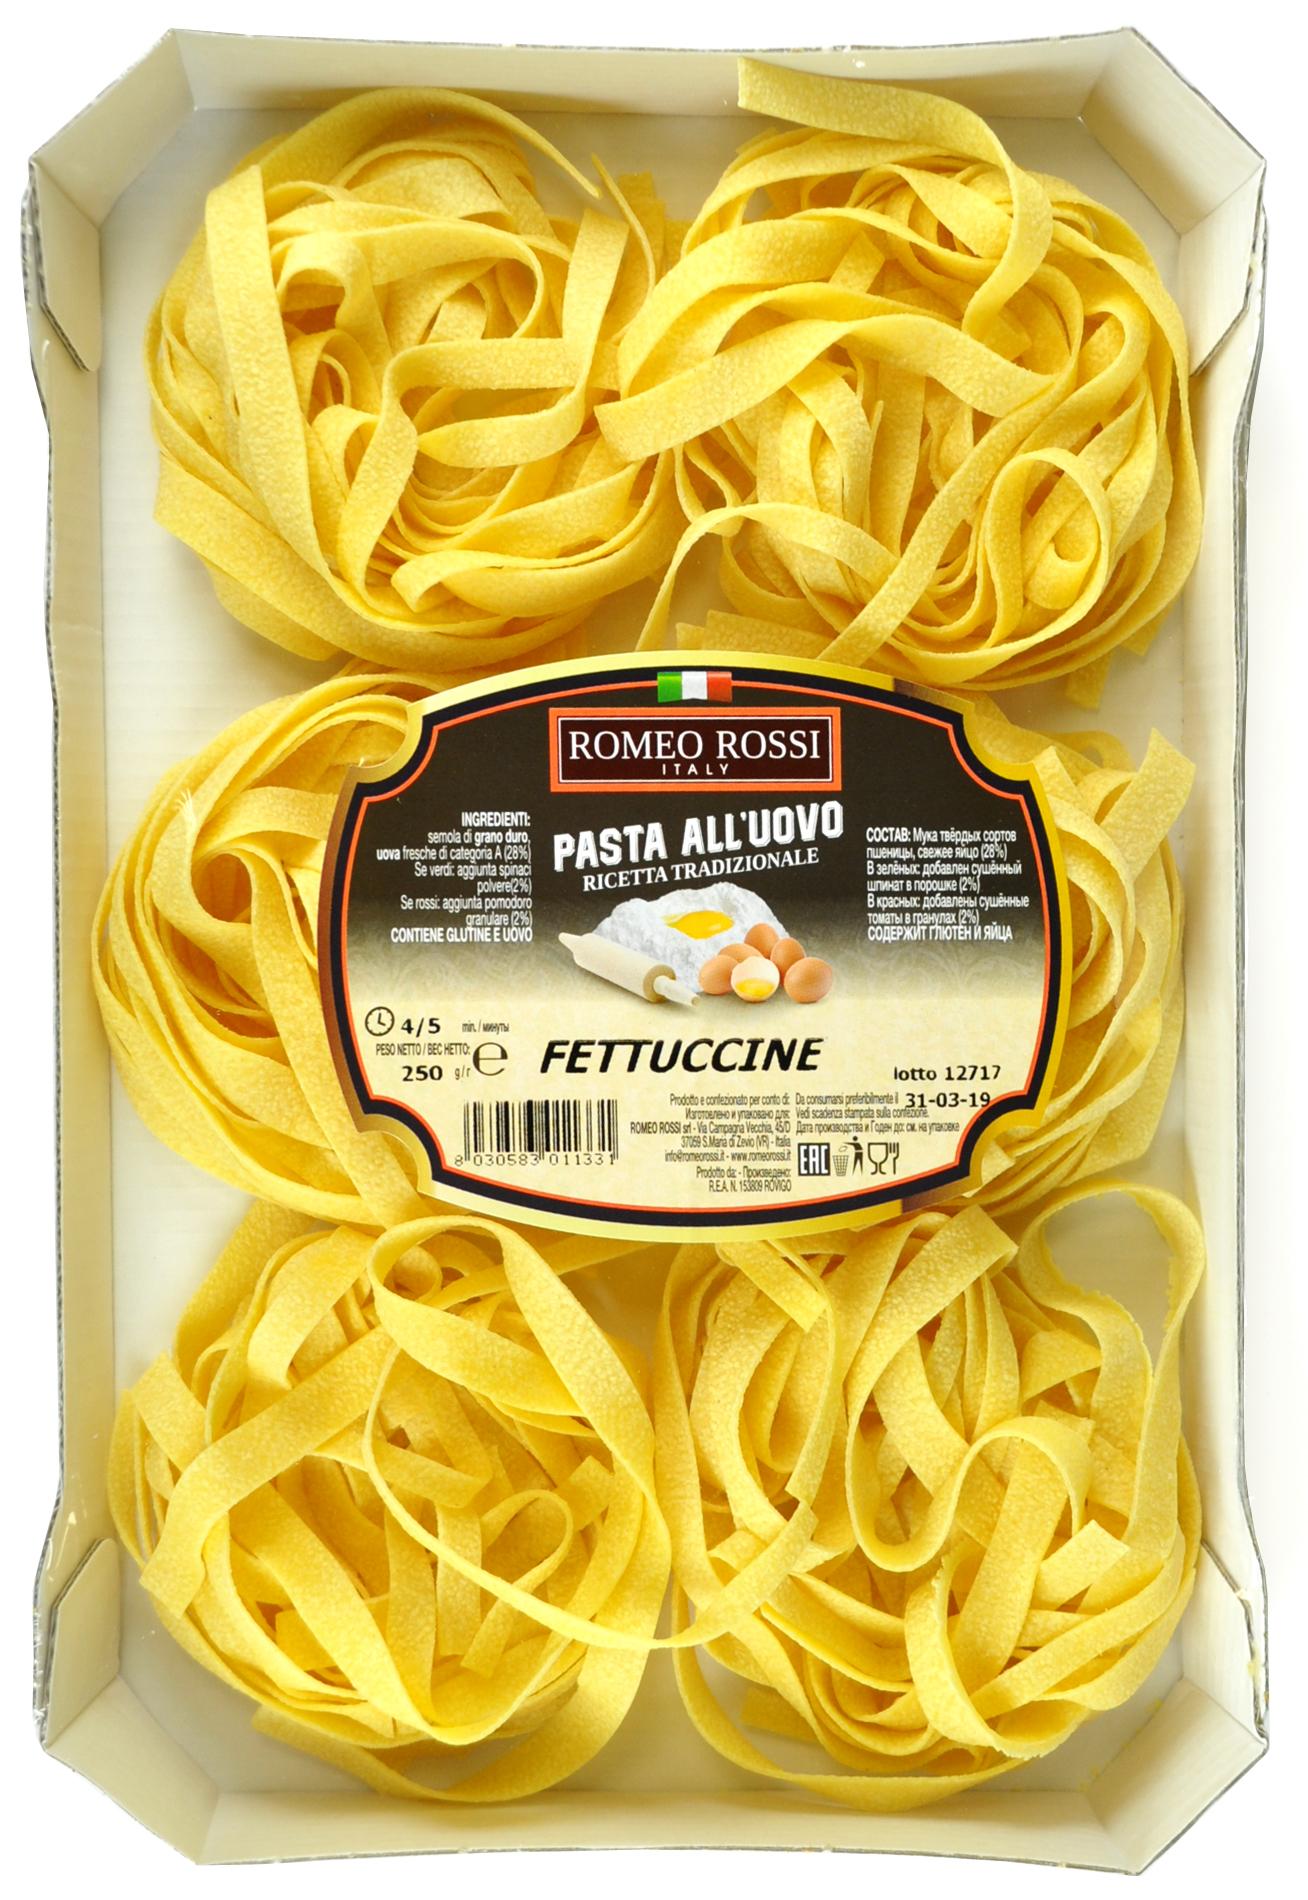 Romeo Rossi паста яичная 8 яиц феттучине, 250 г romeo rossi паста яичная 8 яиц паппарделле 500 г